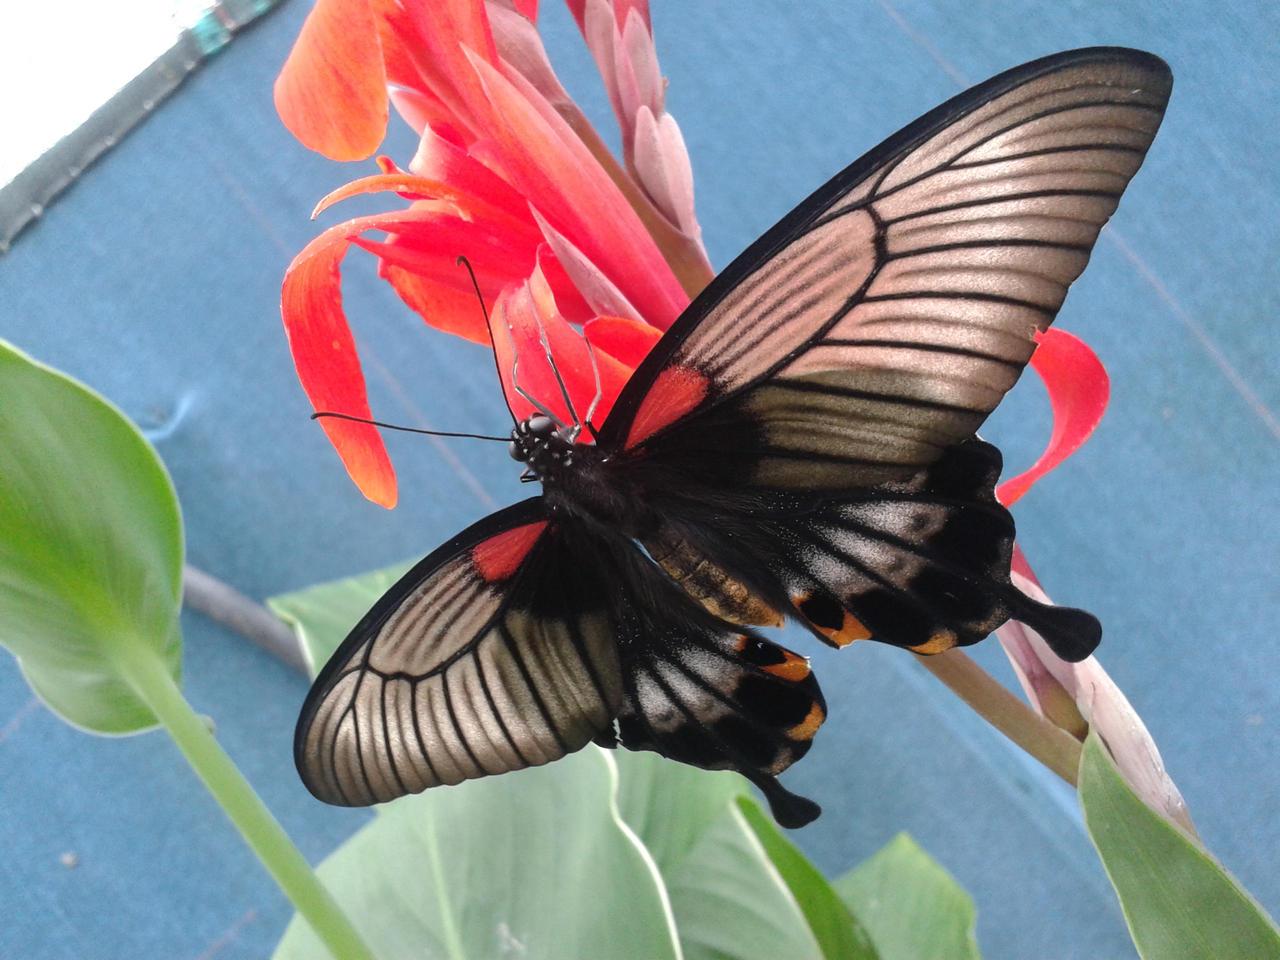 Nature's precious by Alphagoth